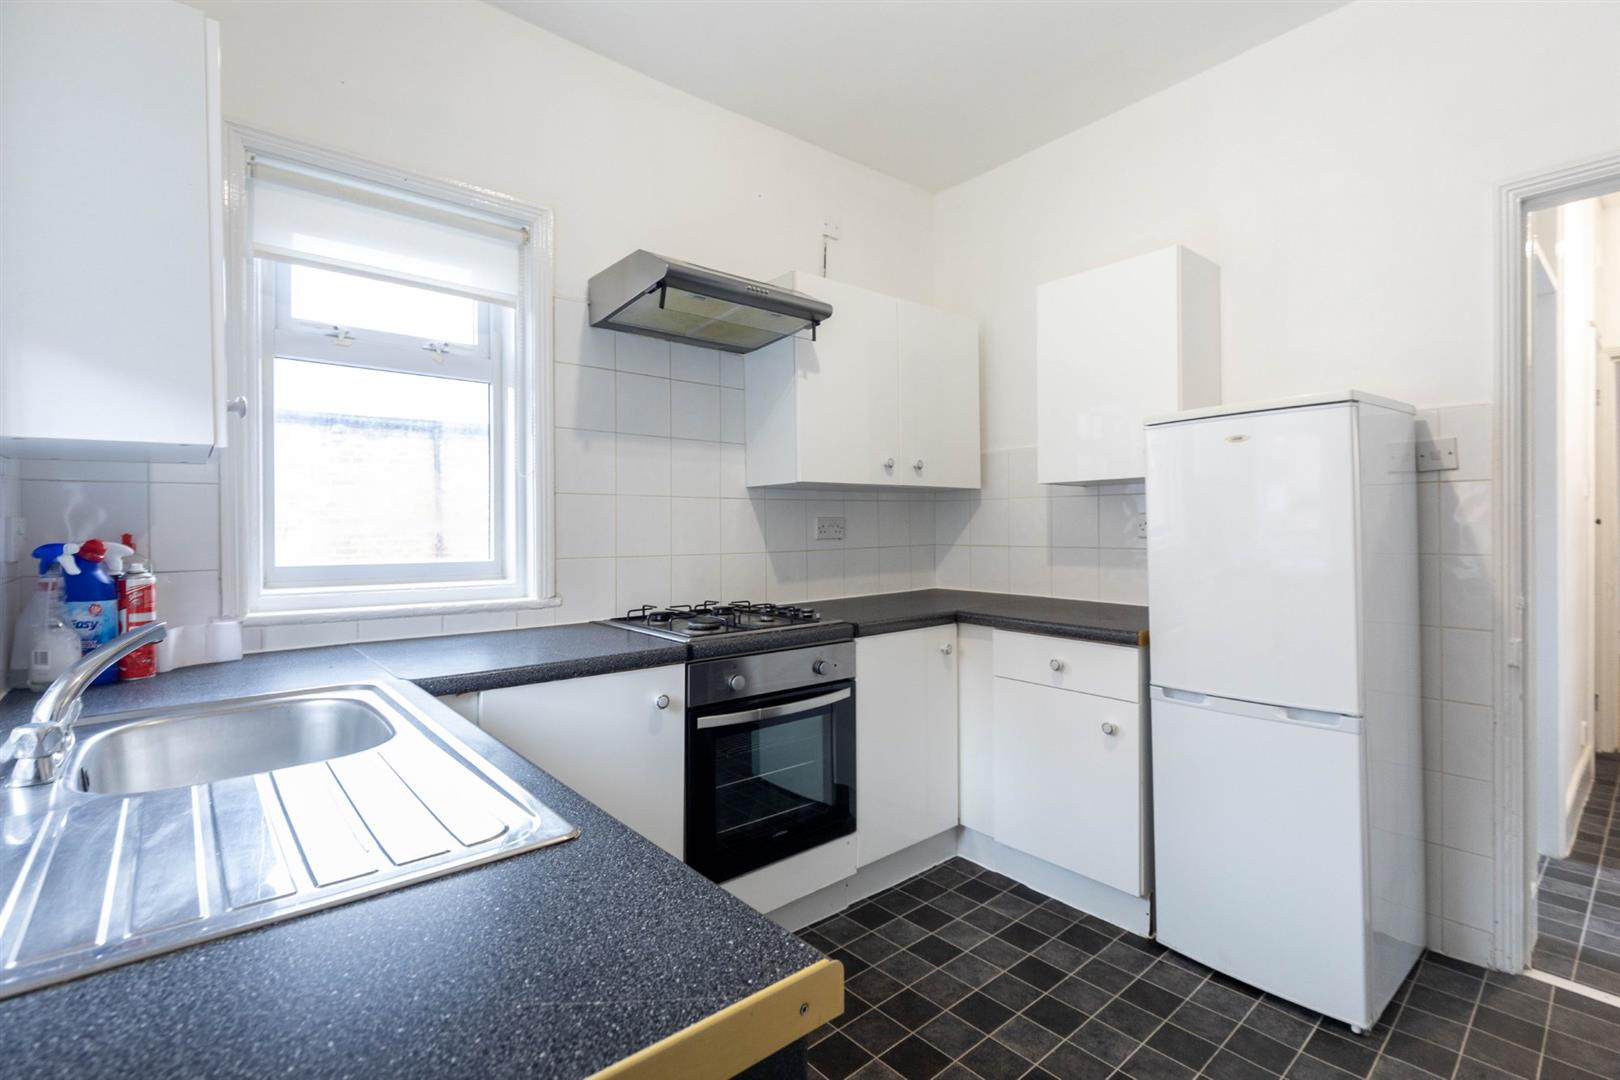 3 bed flat to rent in Fenham, NE4 9AH, NE4